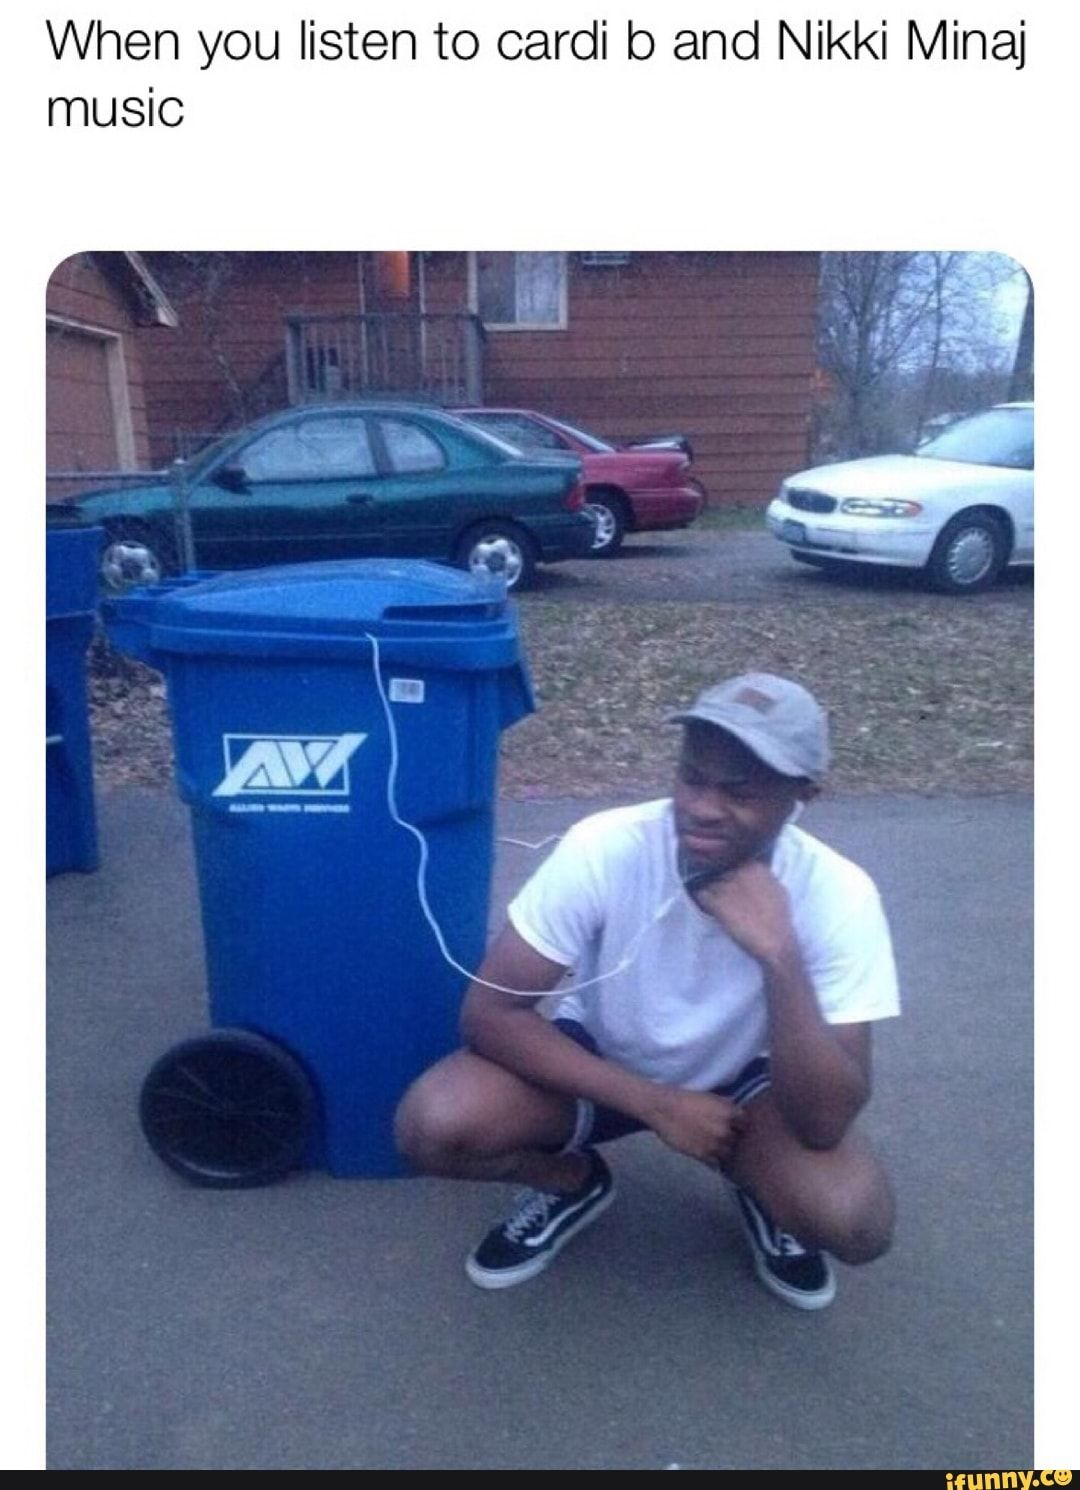 When You Listen To Cardi B And Nikki Minaj Music Ifunny Trash Meme Memes Current Mood Meme